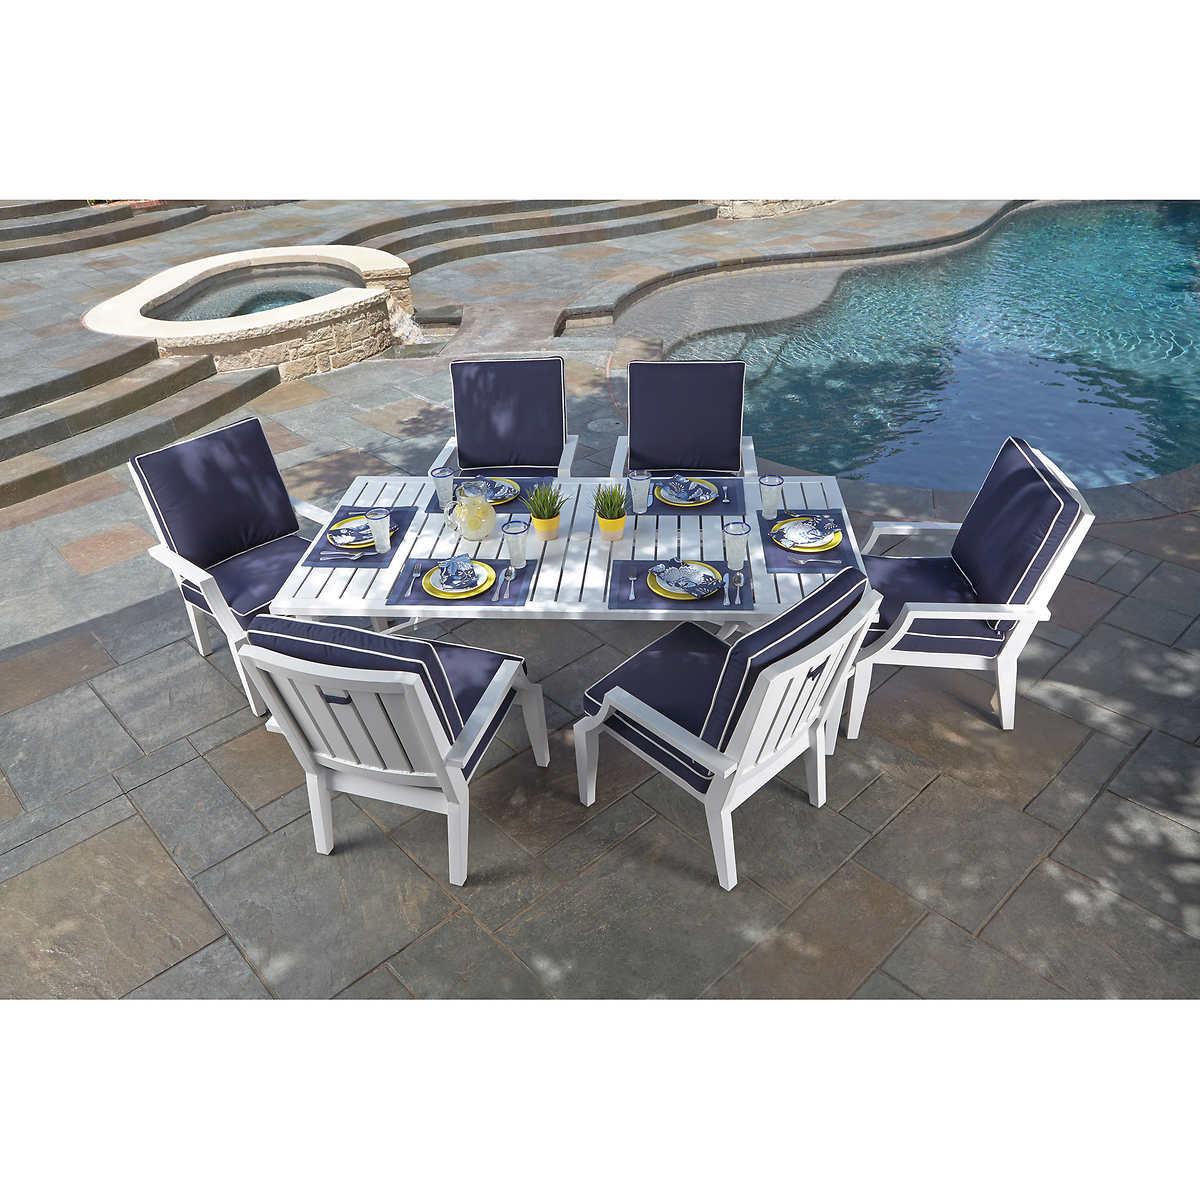 Patio Furniture 7 Piece Set seaview 7-piece patio dining set